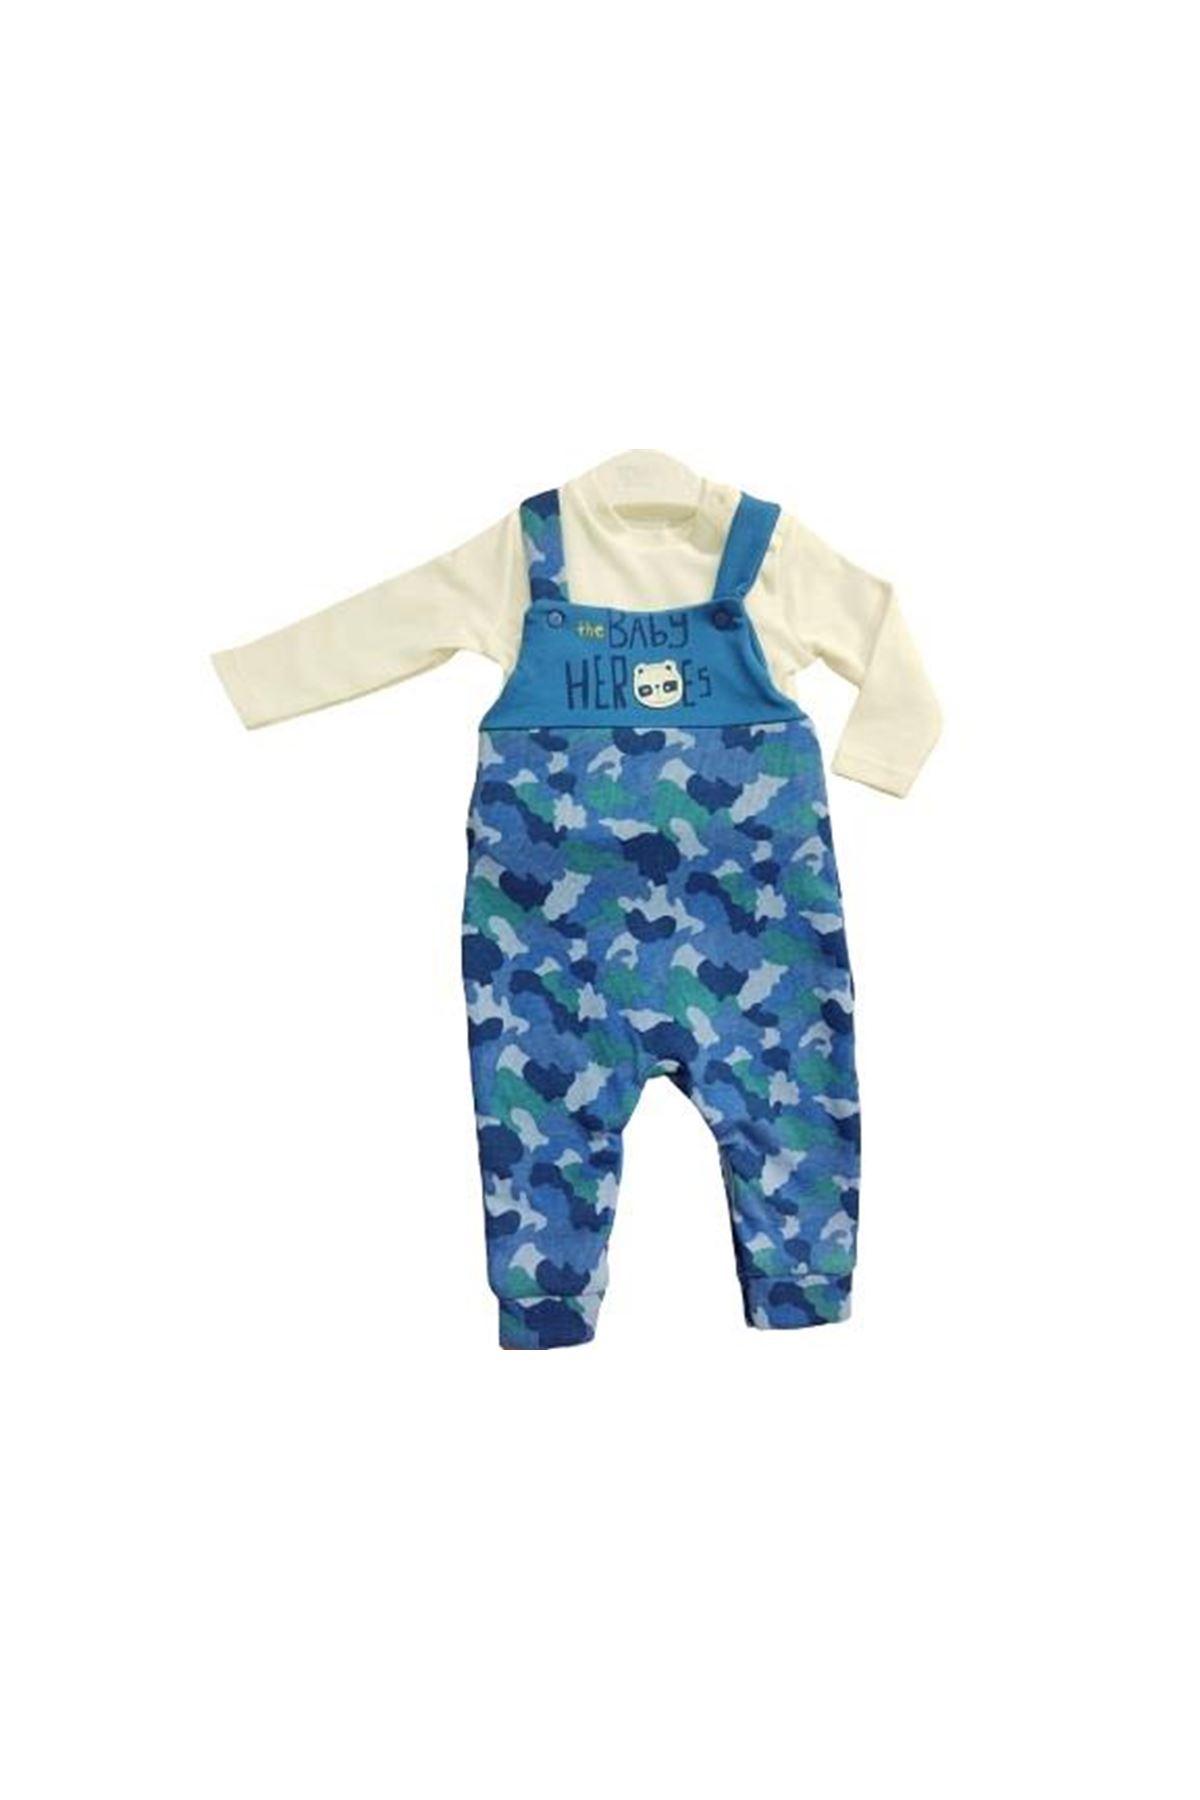 Tongs Baby Salopet Tulum 2686 Mavi